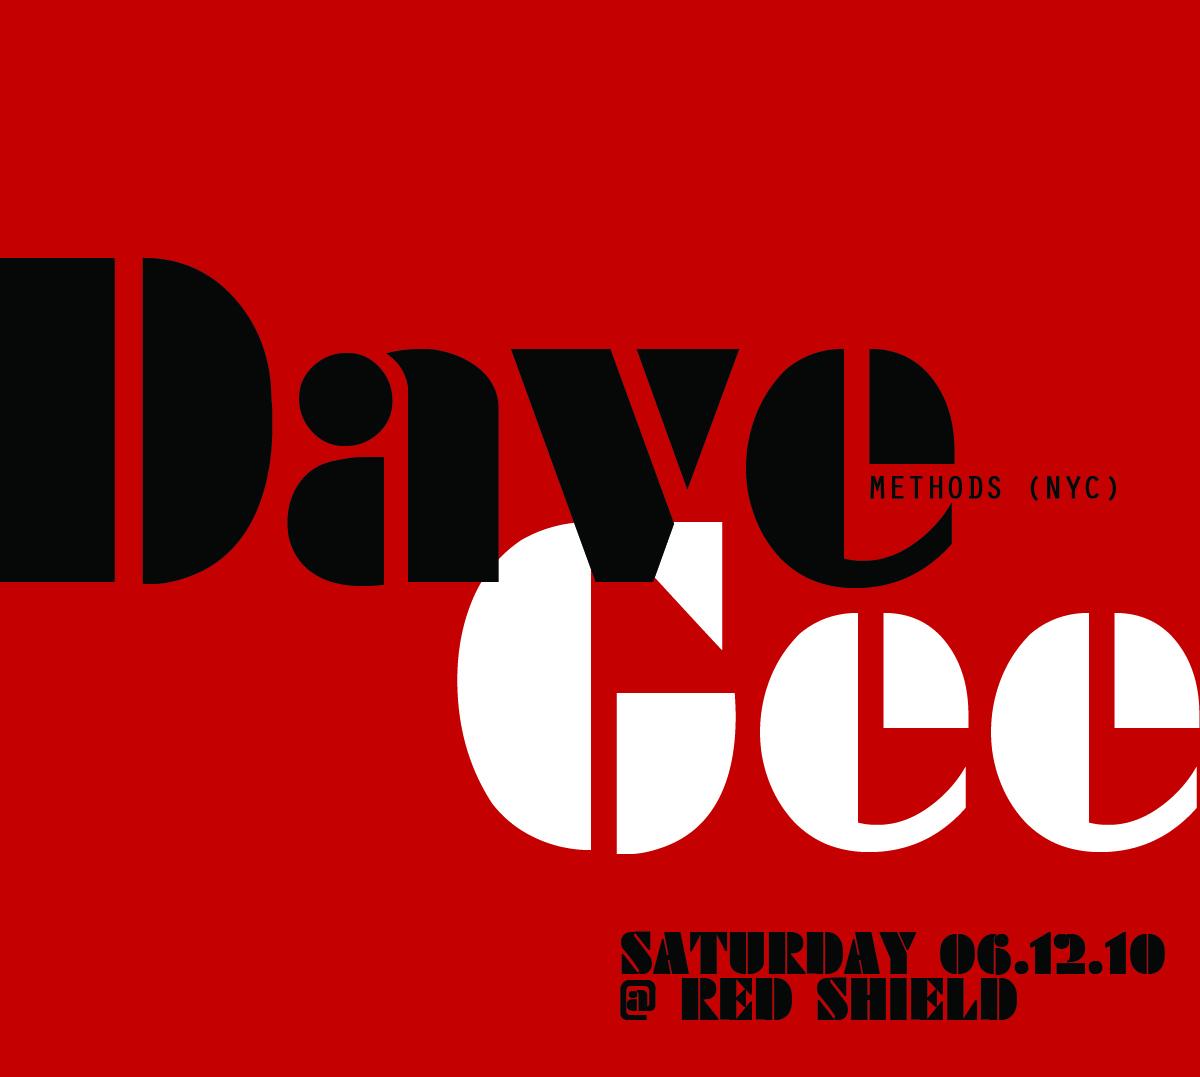 Dave Gee.jpg